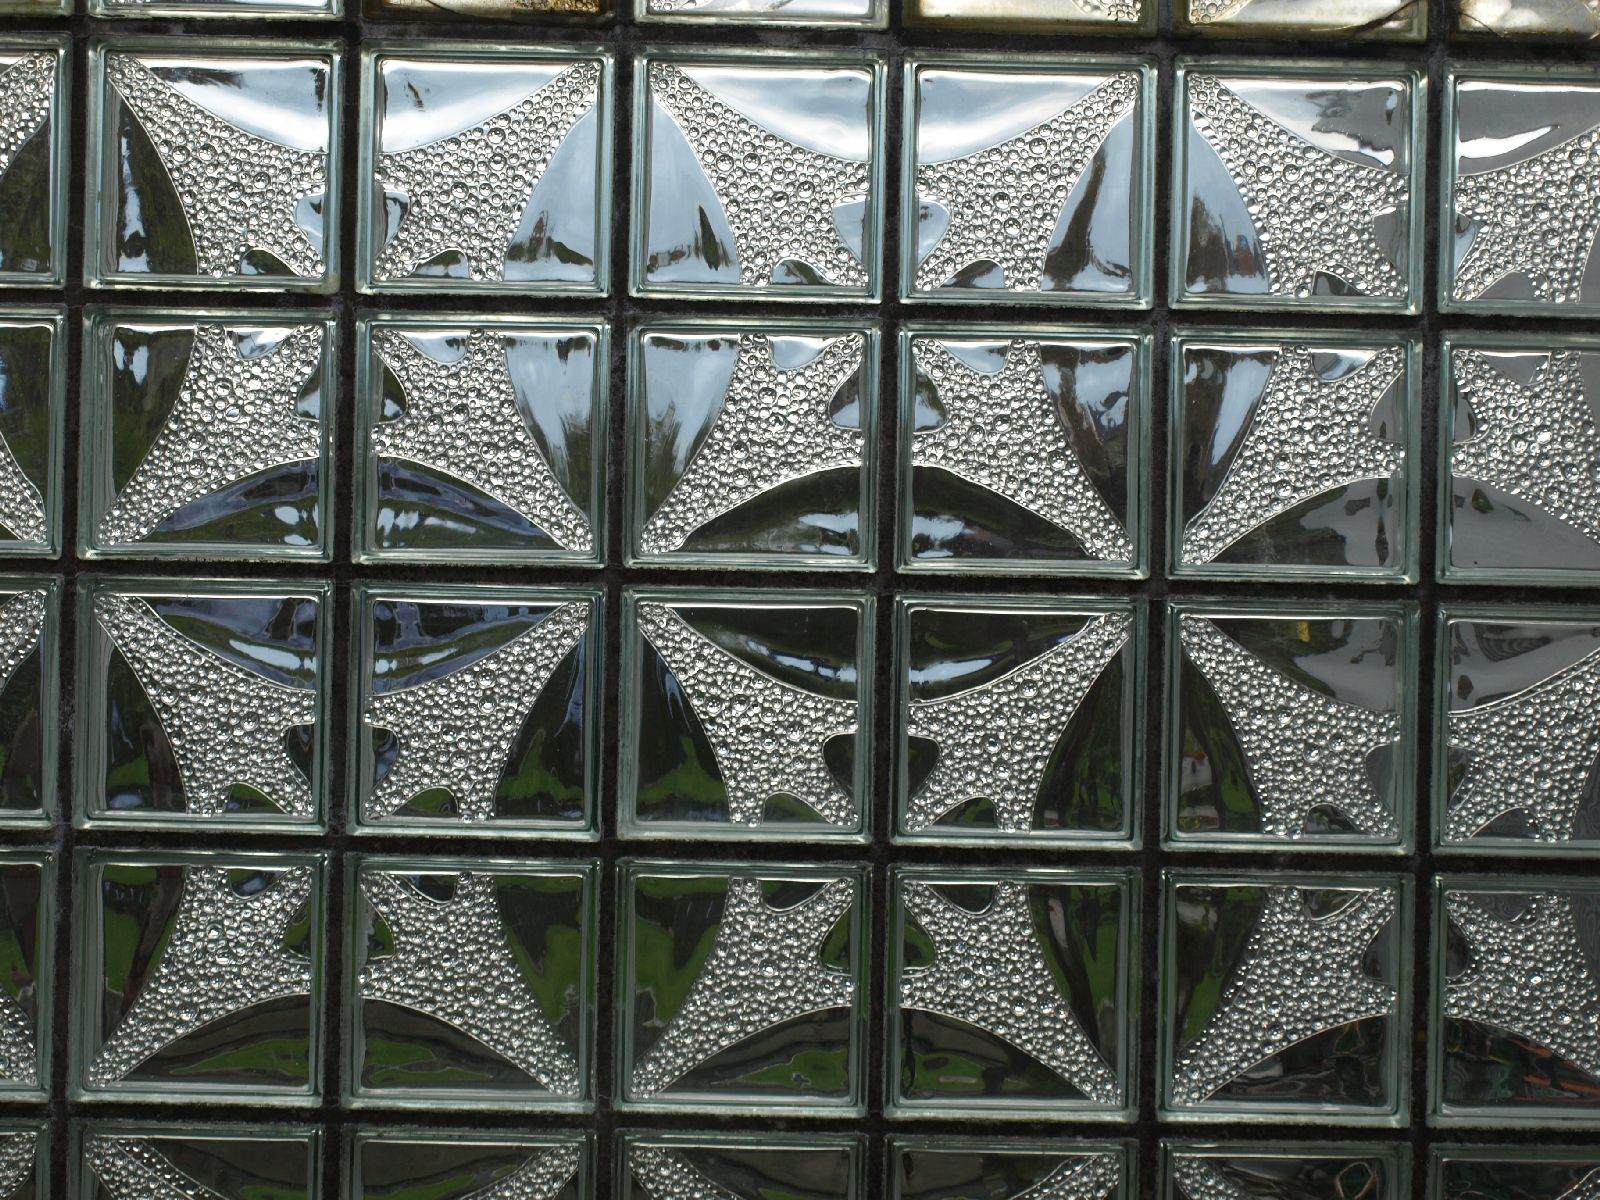 Brick_Texture_A_PA110179